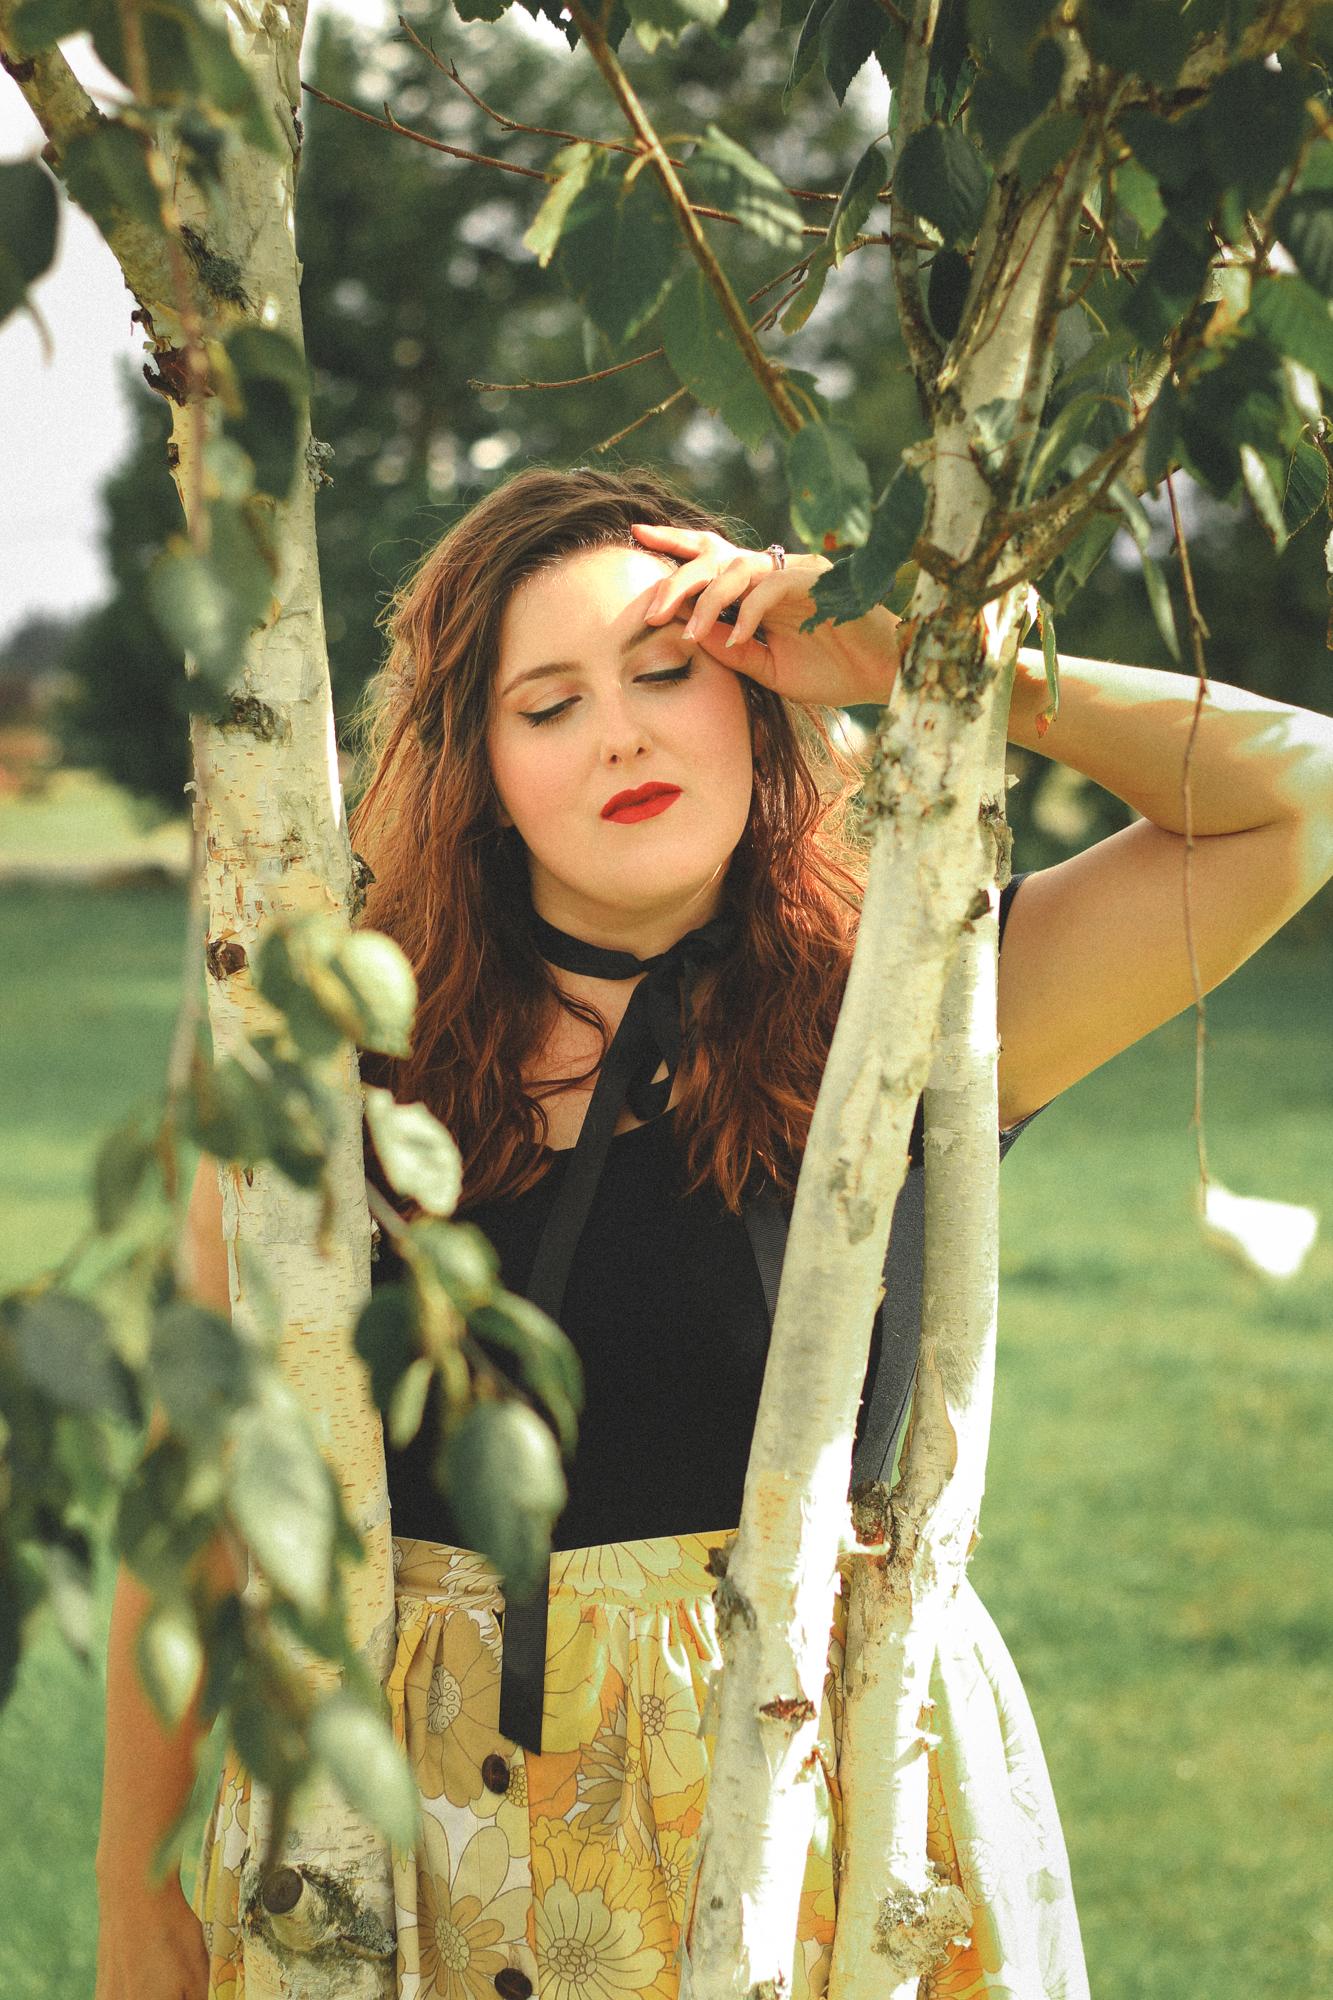 woman posing like a nymph in birch trees